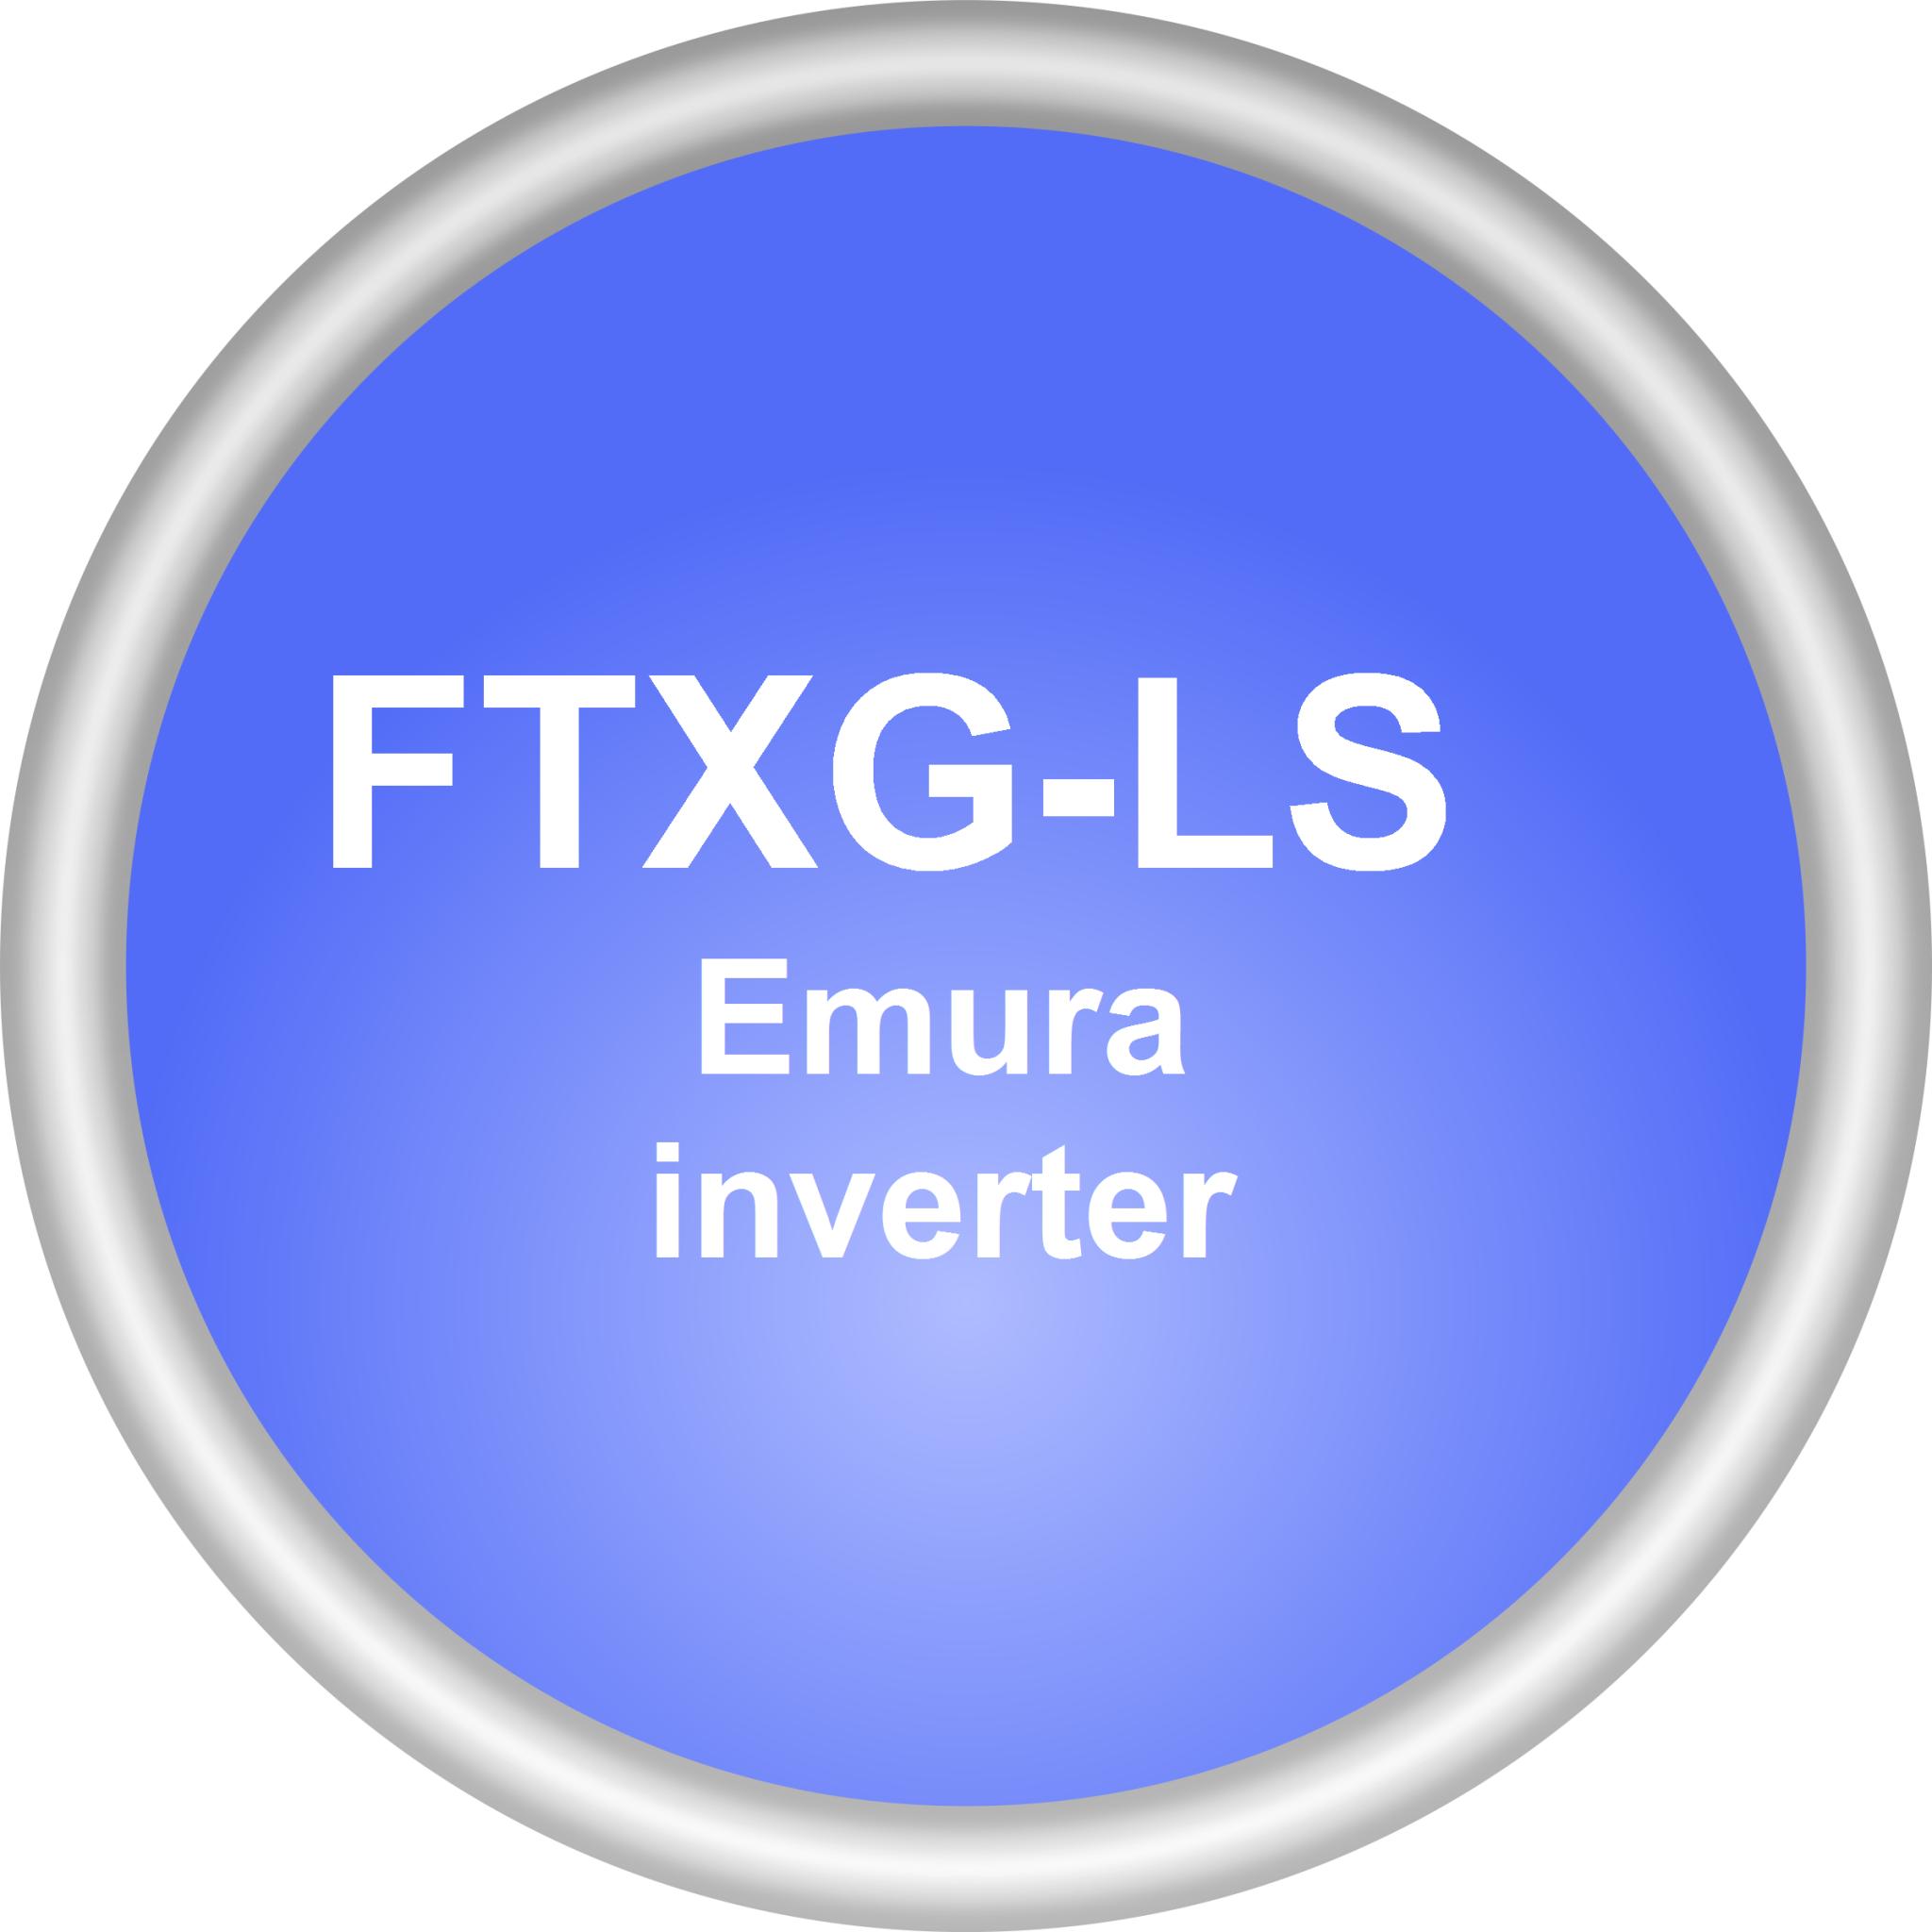 Инвертор FTXG-LS Emura